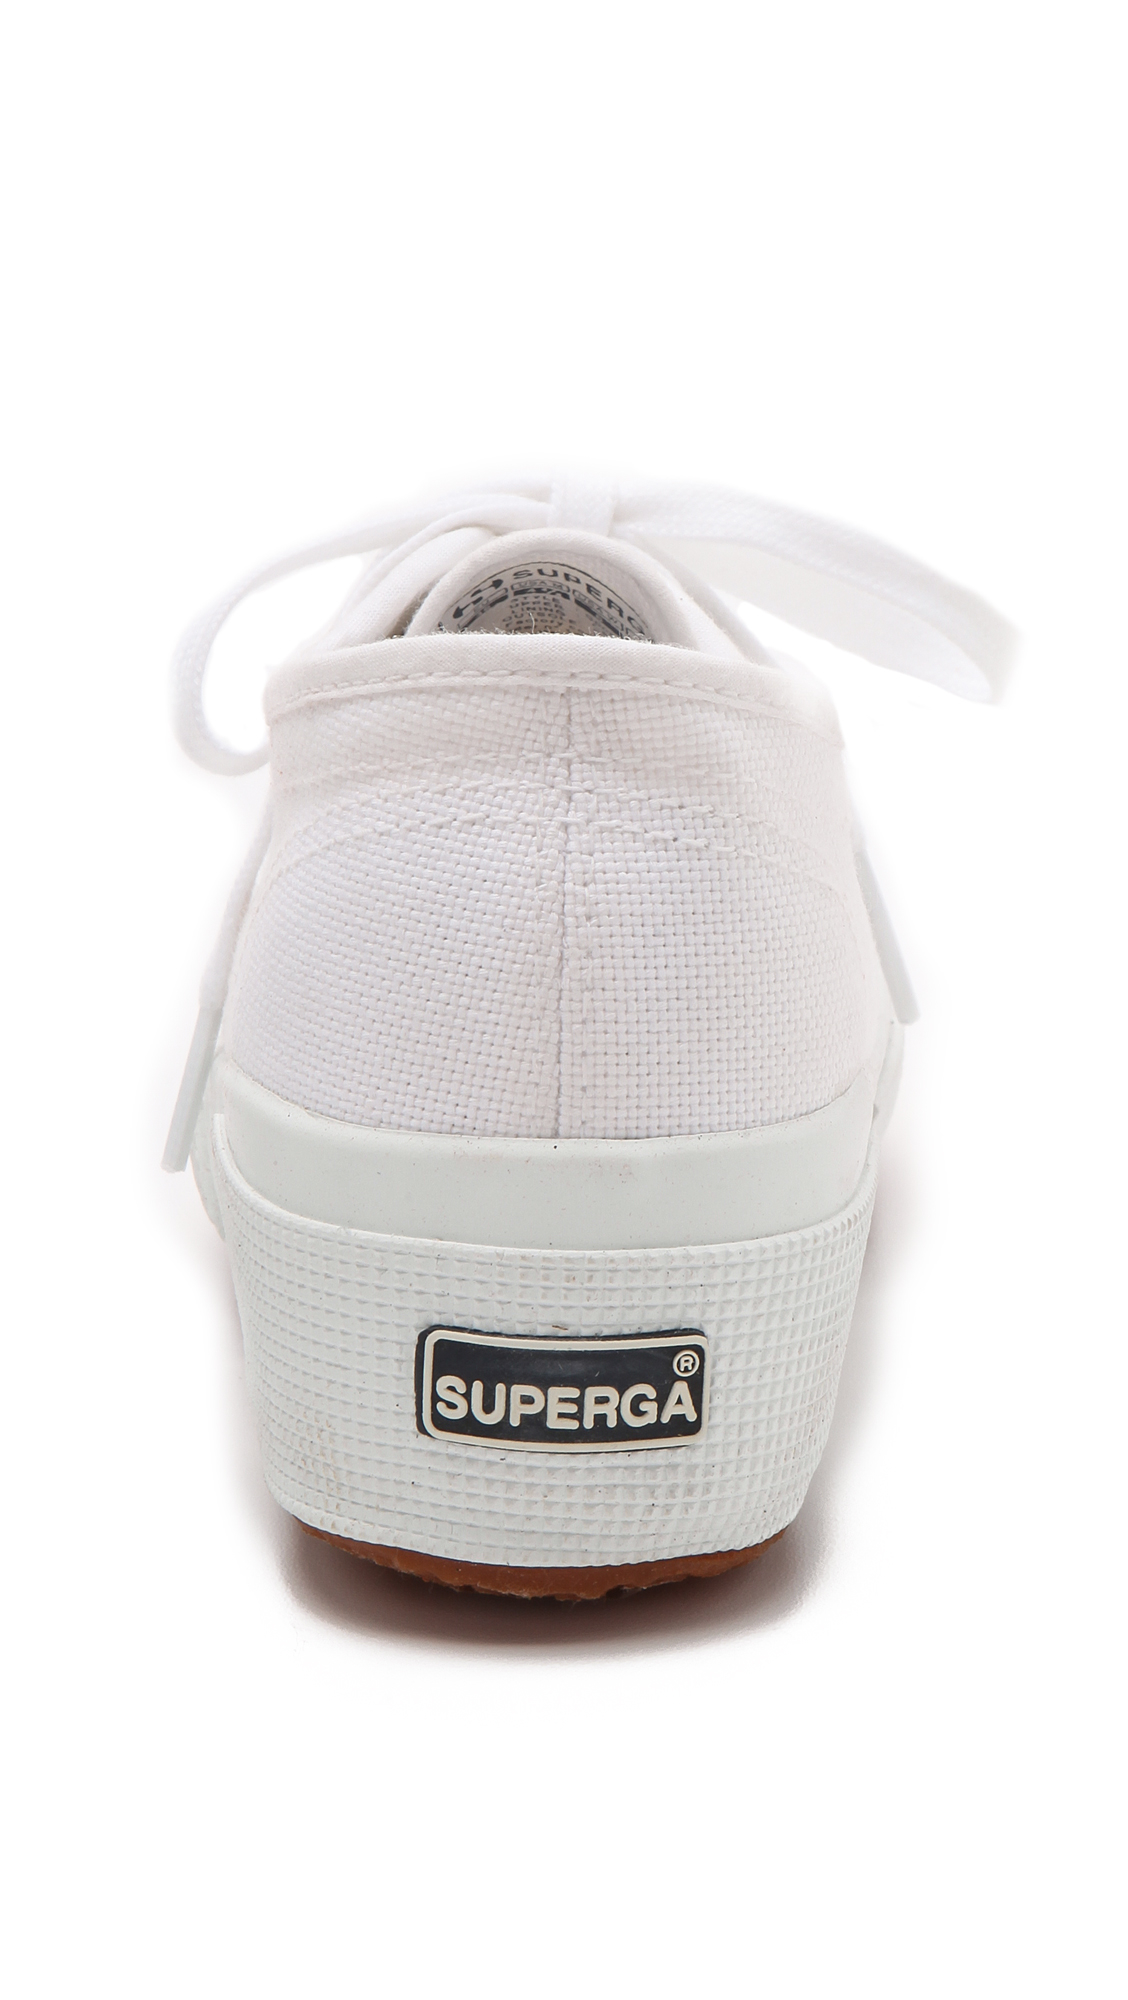 789147b04b71 Lyst - Superga Cotu Wedge Sneakers - White in White